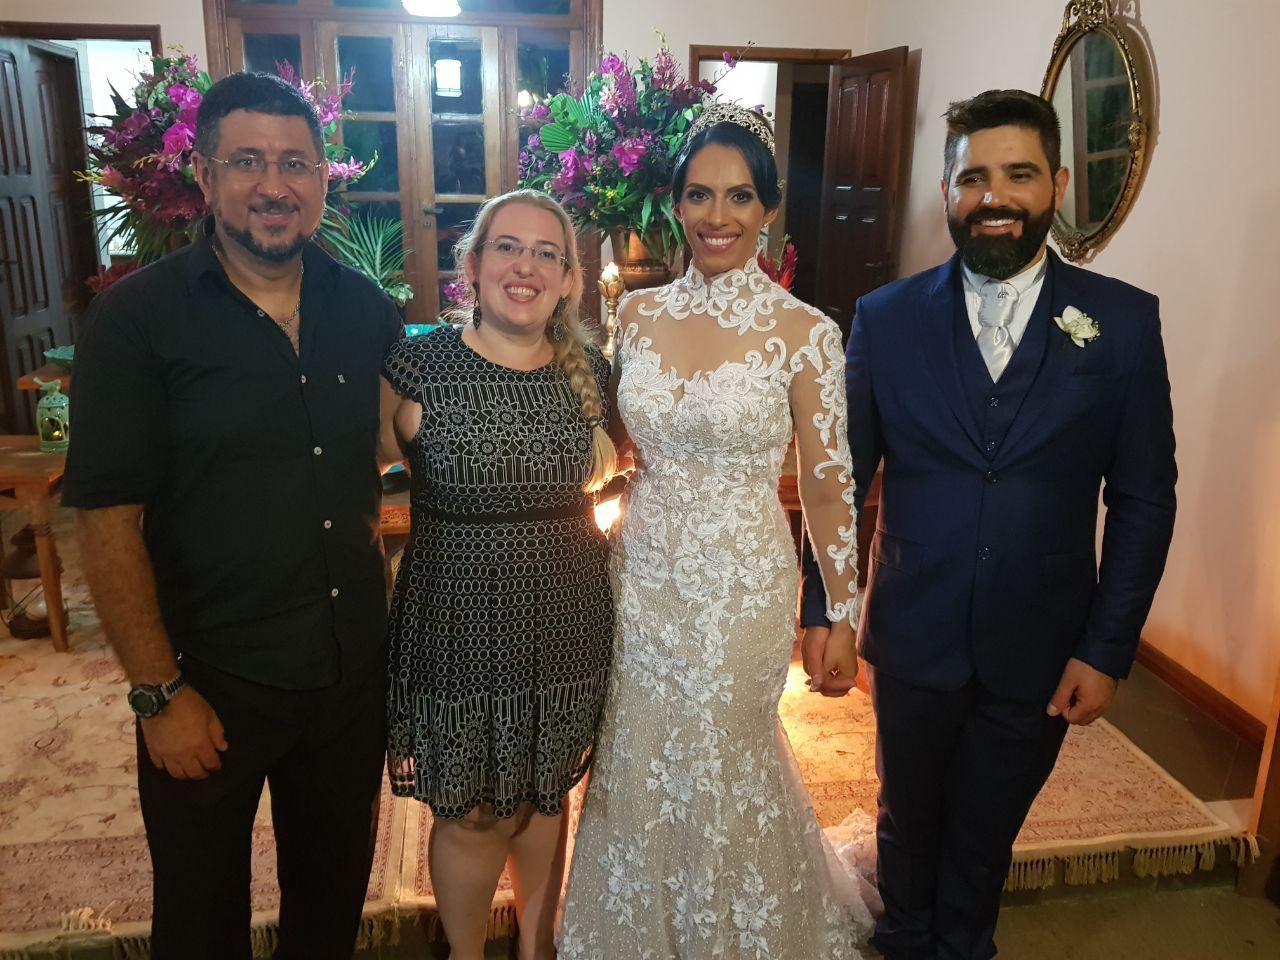 Rio Preto MG Luciane Borges musicos para casamento contratar musico contratar musico para casamento